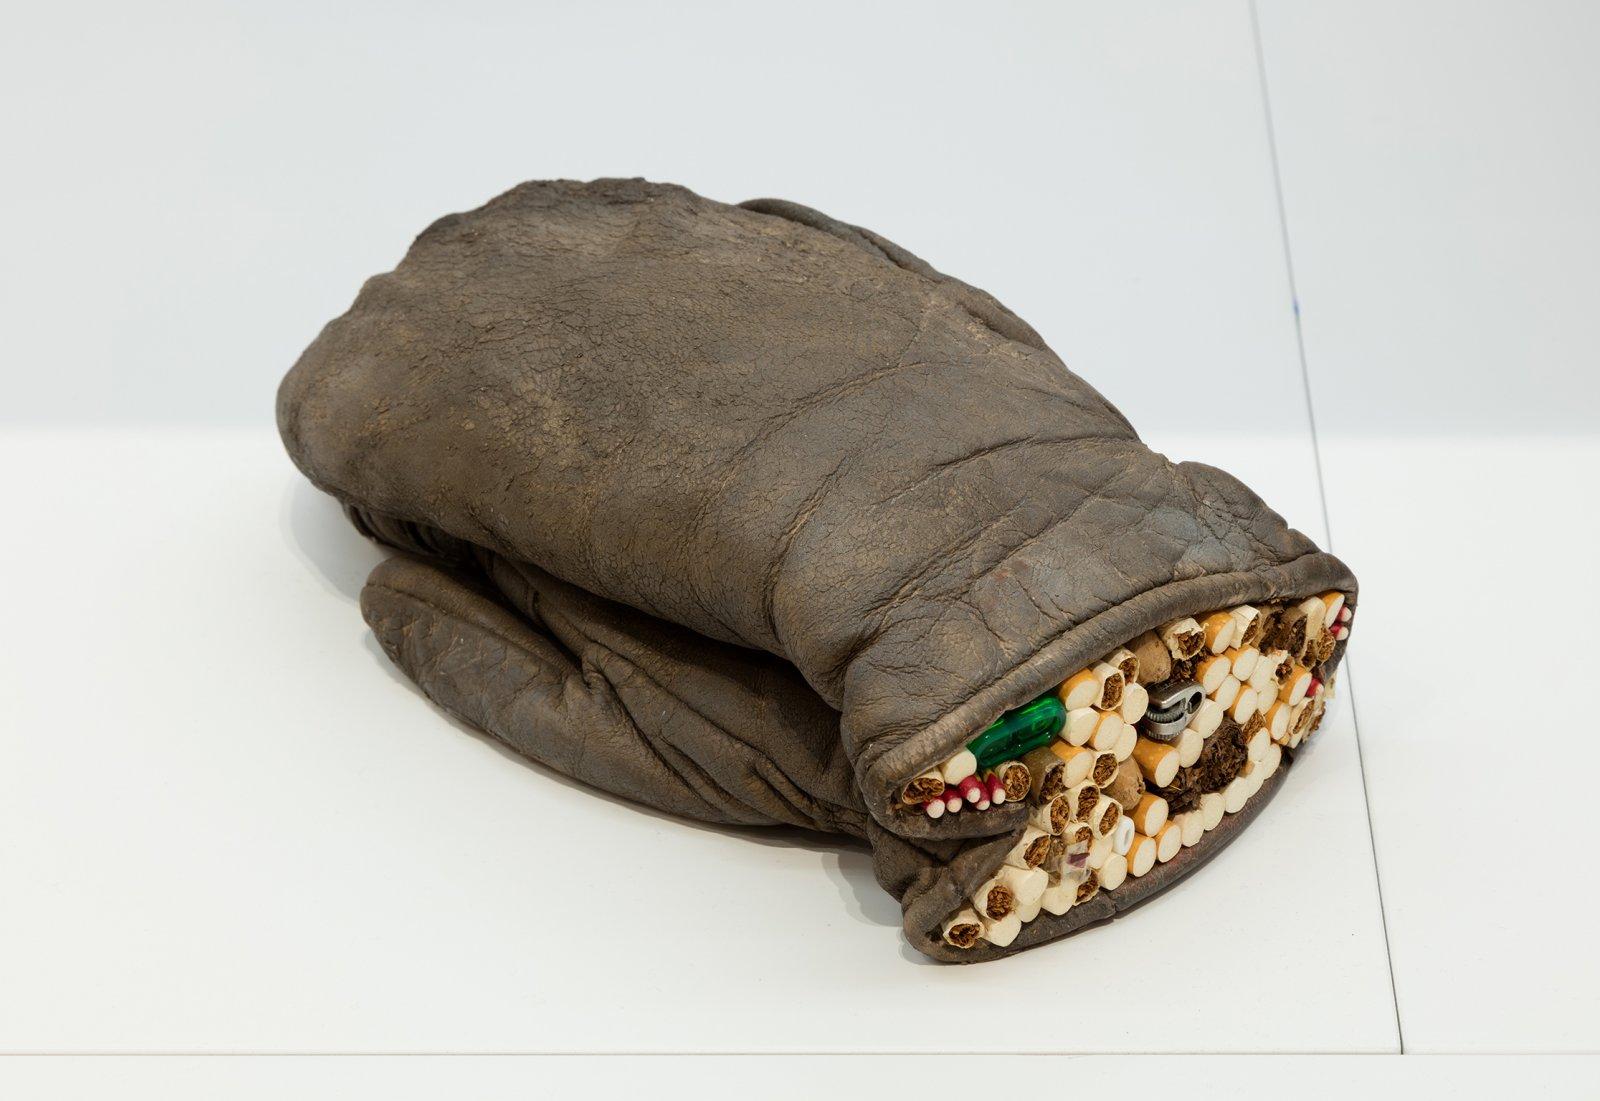 Liz Magor, Humidor, 2004, polymerized gypsum, tobacco, 11 x 6 x 4 in. (28 x 15 x 10 cm) by Liz Magor